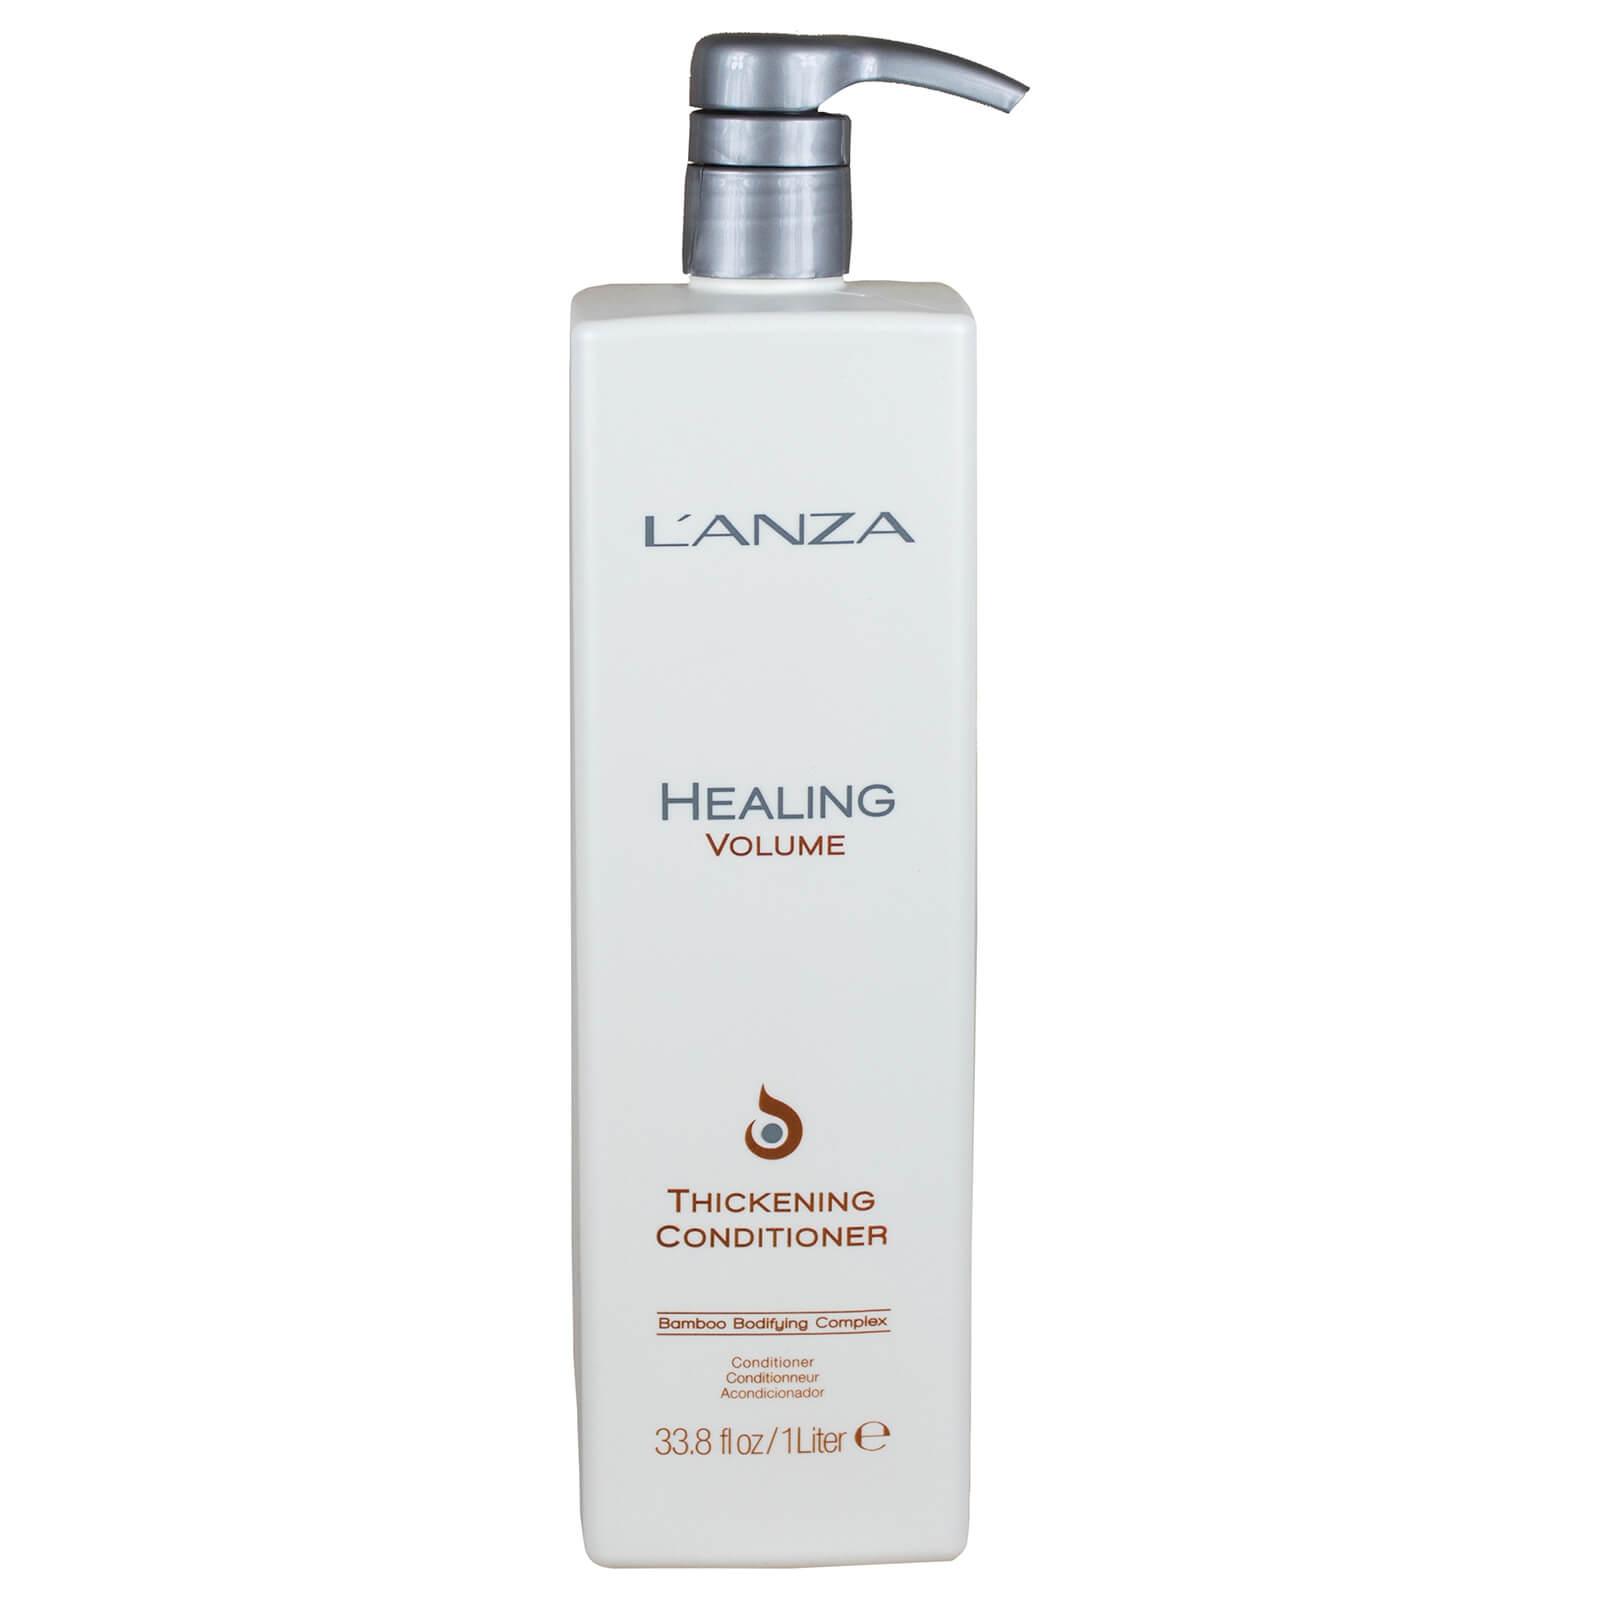 L'Anza Après-shampooing  Healing Volume Thickening de L'Anza (1 litre) - (valeur : 112,50€)